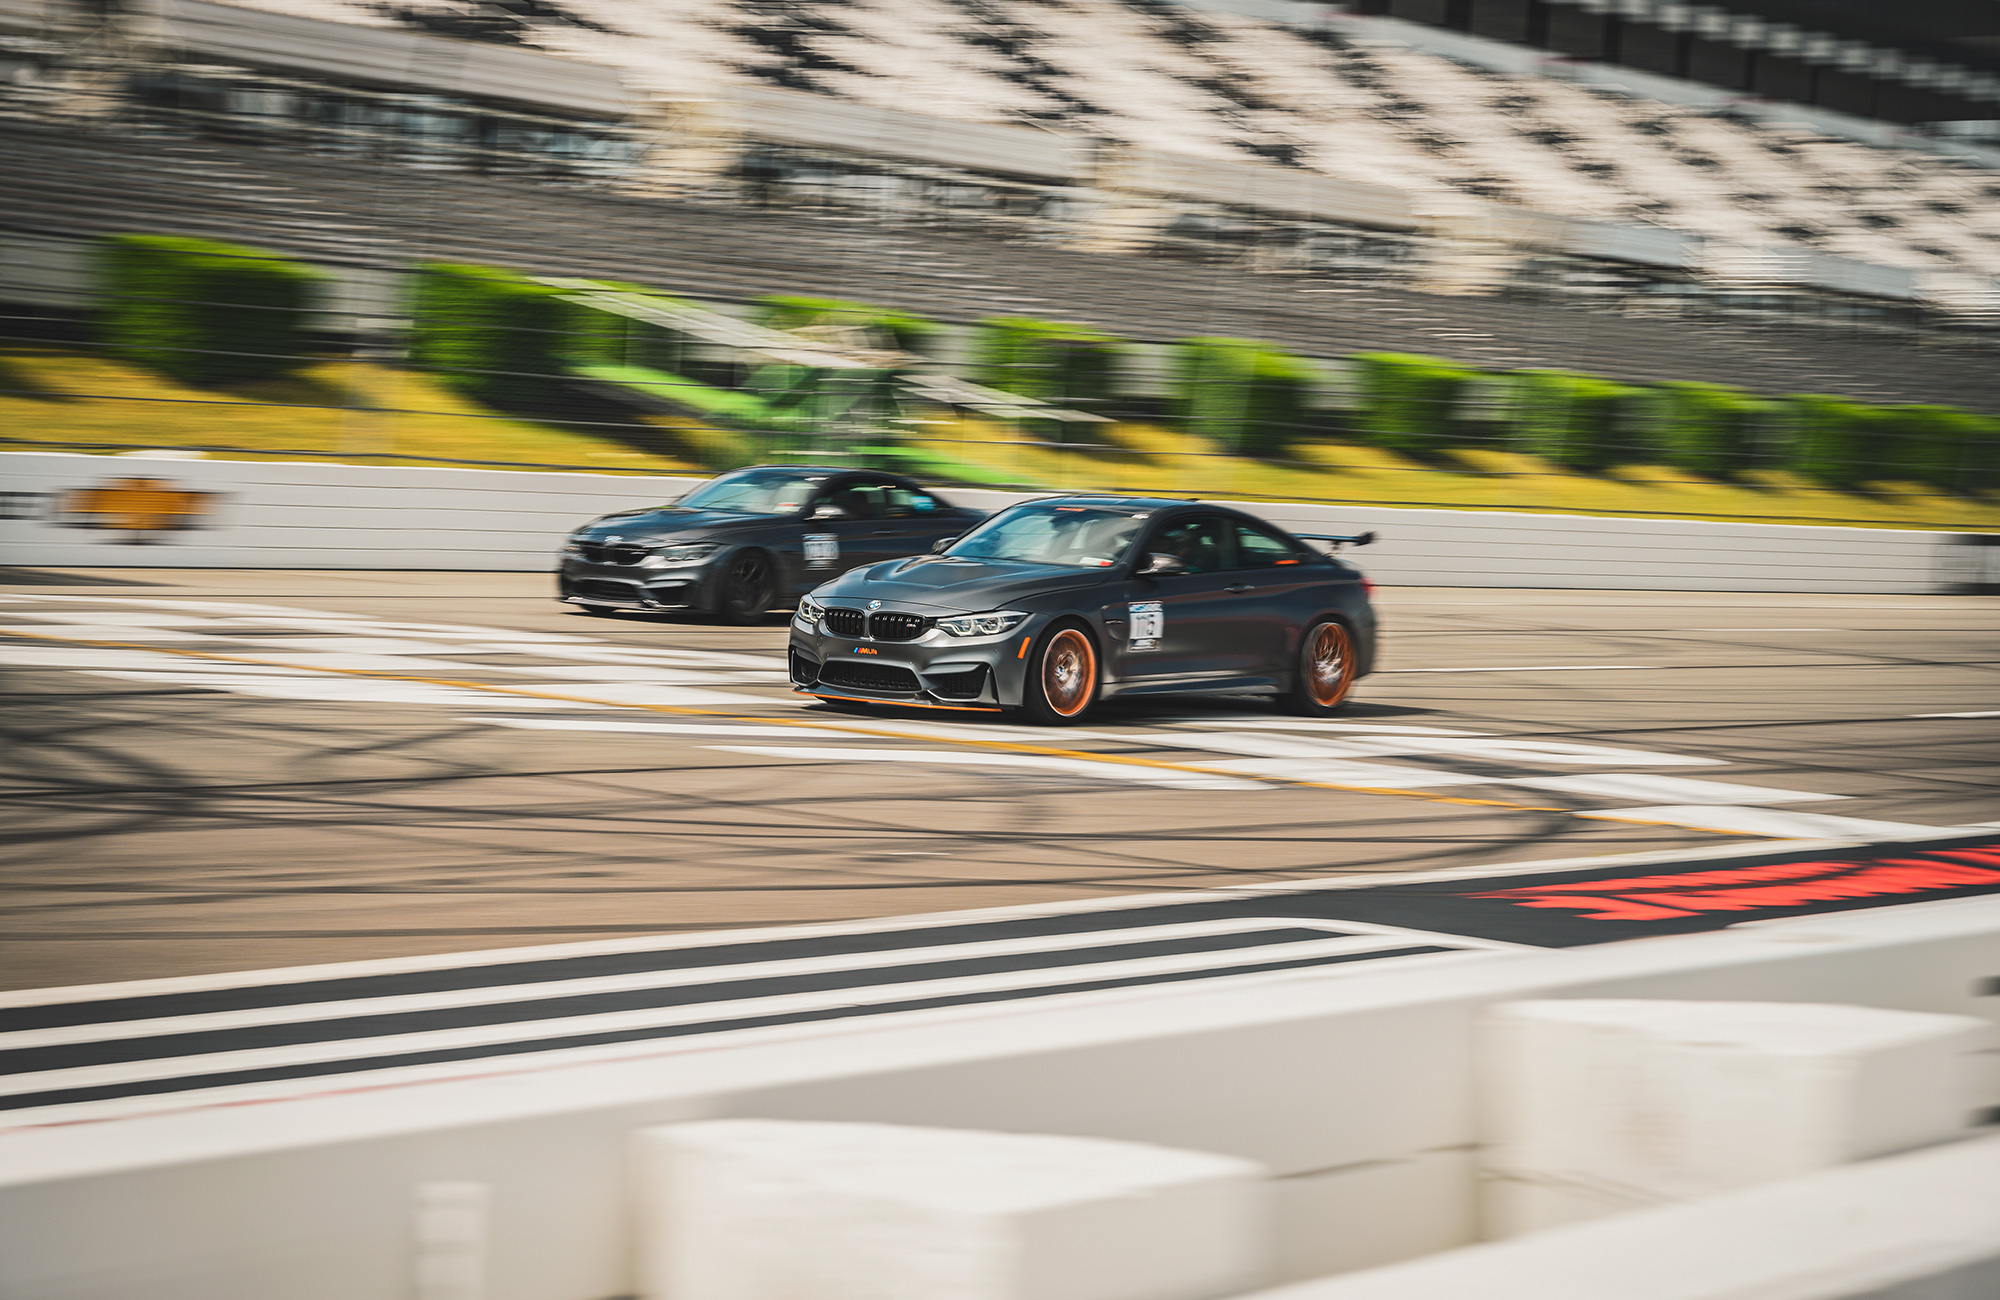 BMW M4 race